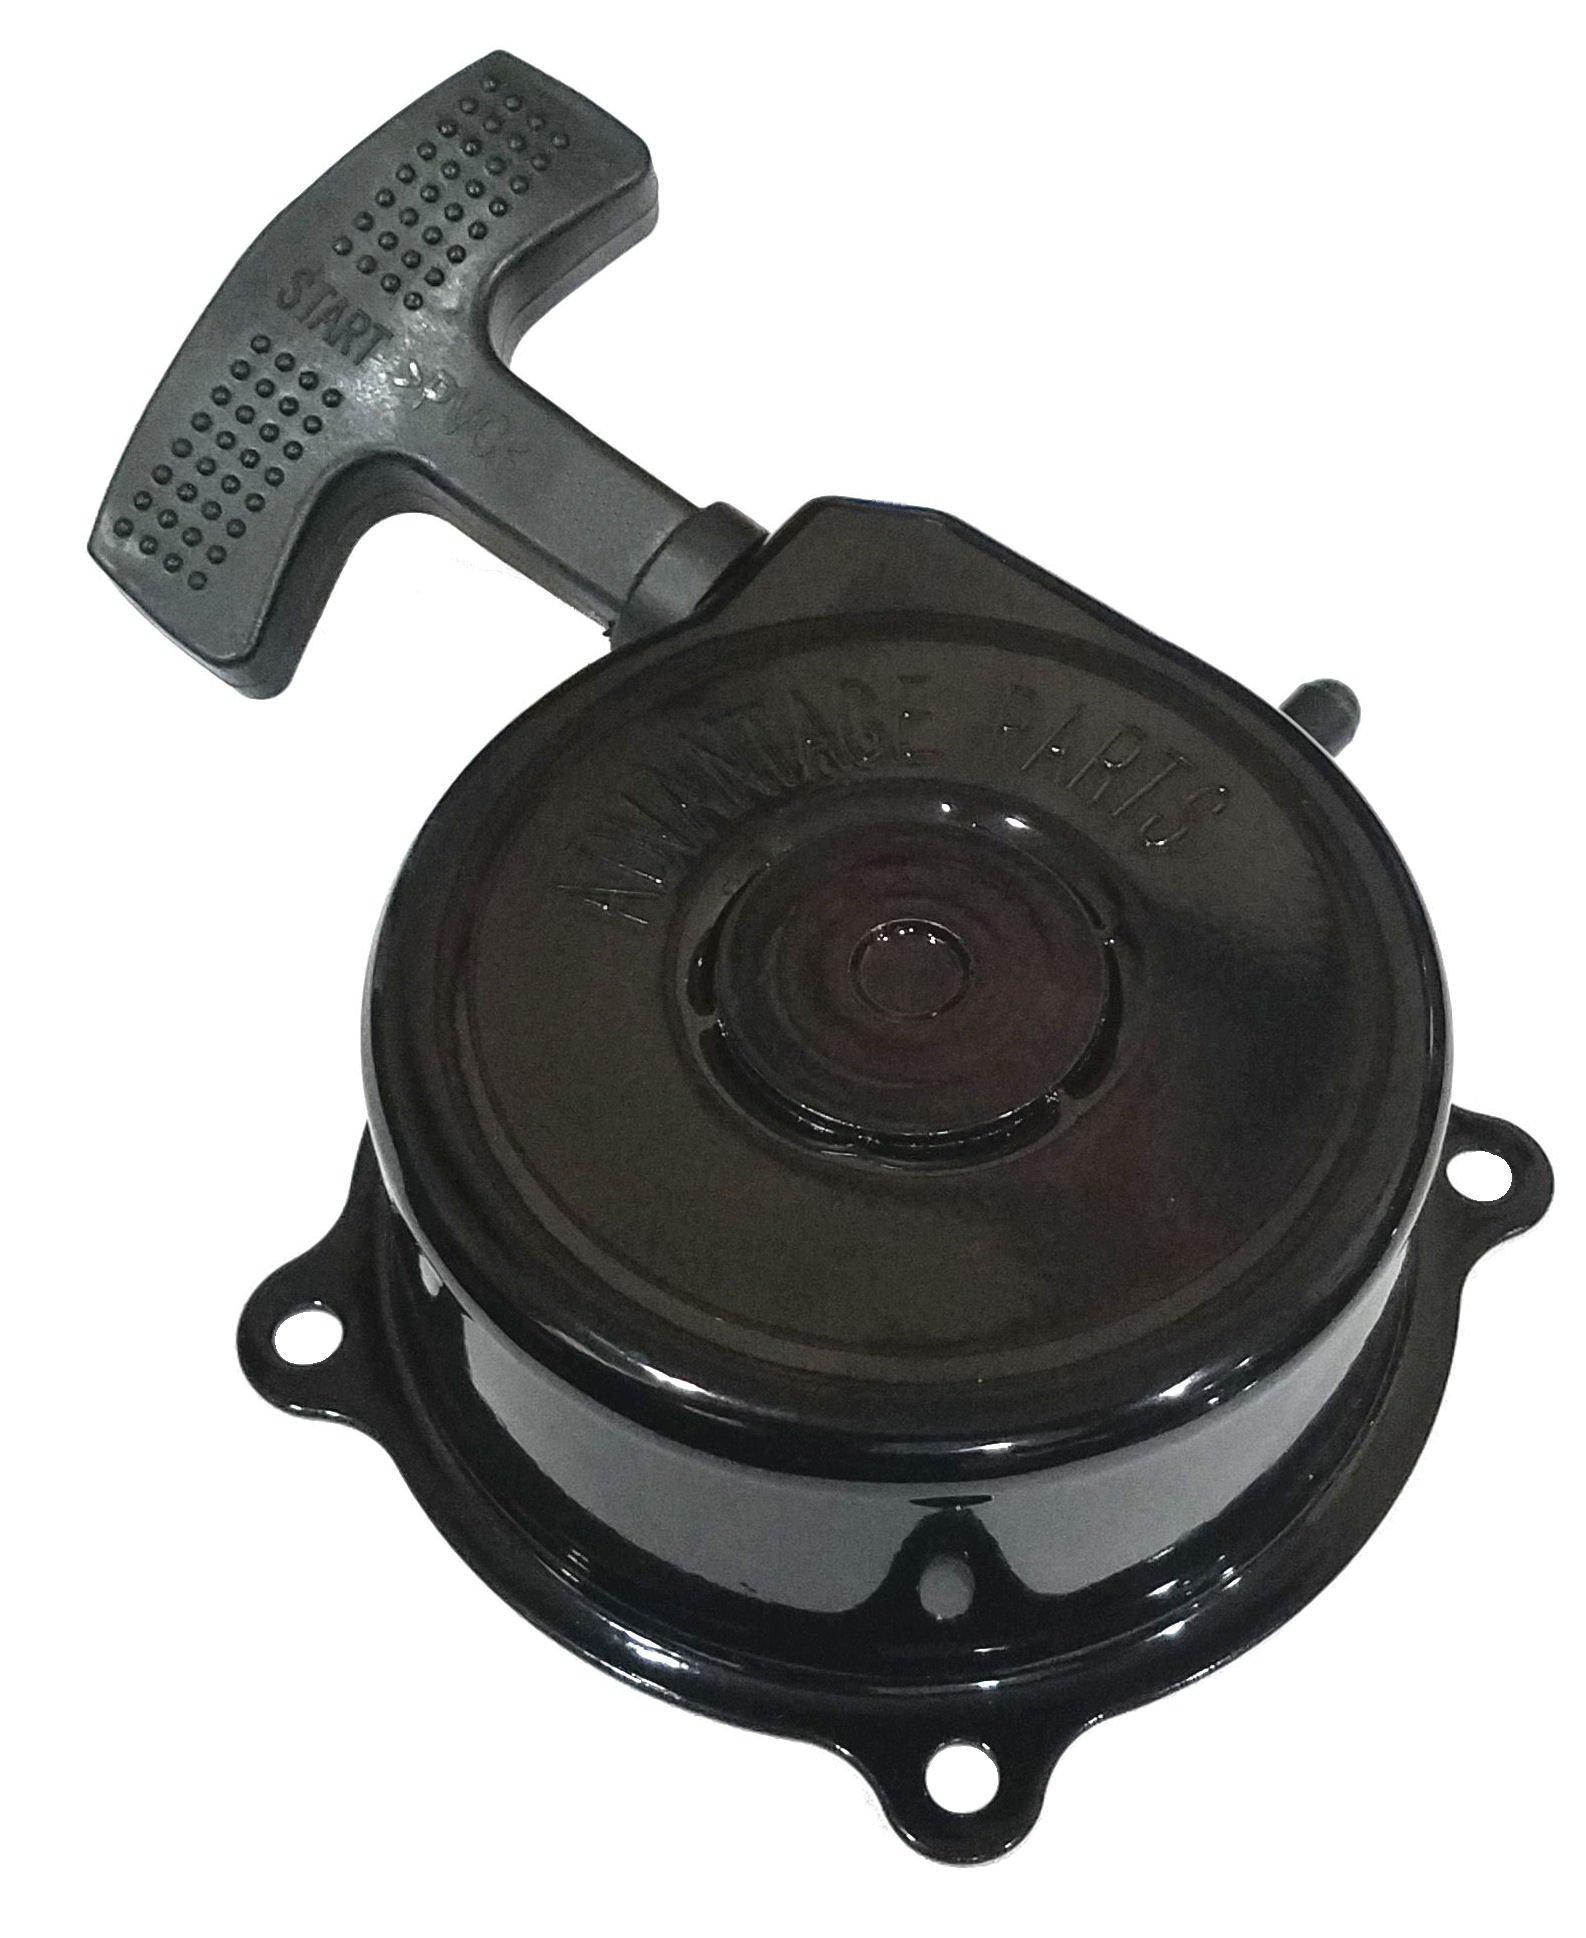 hight resolution of suzuki pull start starter recoil lt a50 alt50 lt50 lt 50 quad master 2002